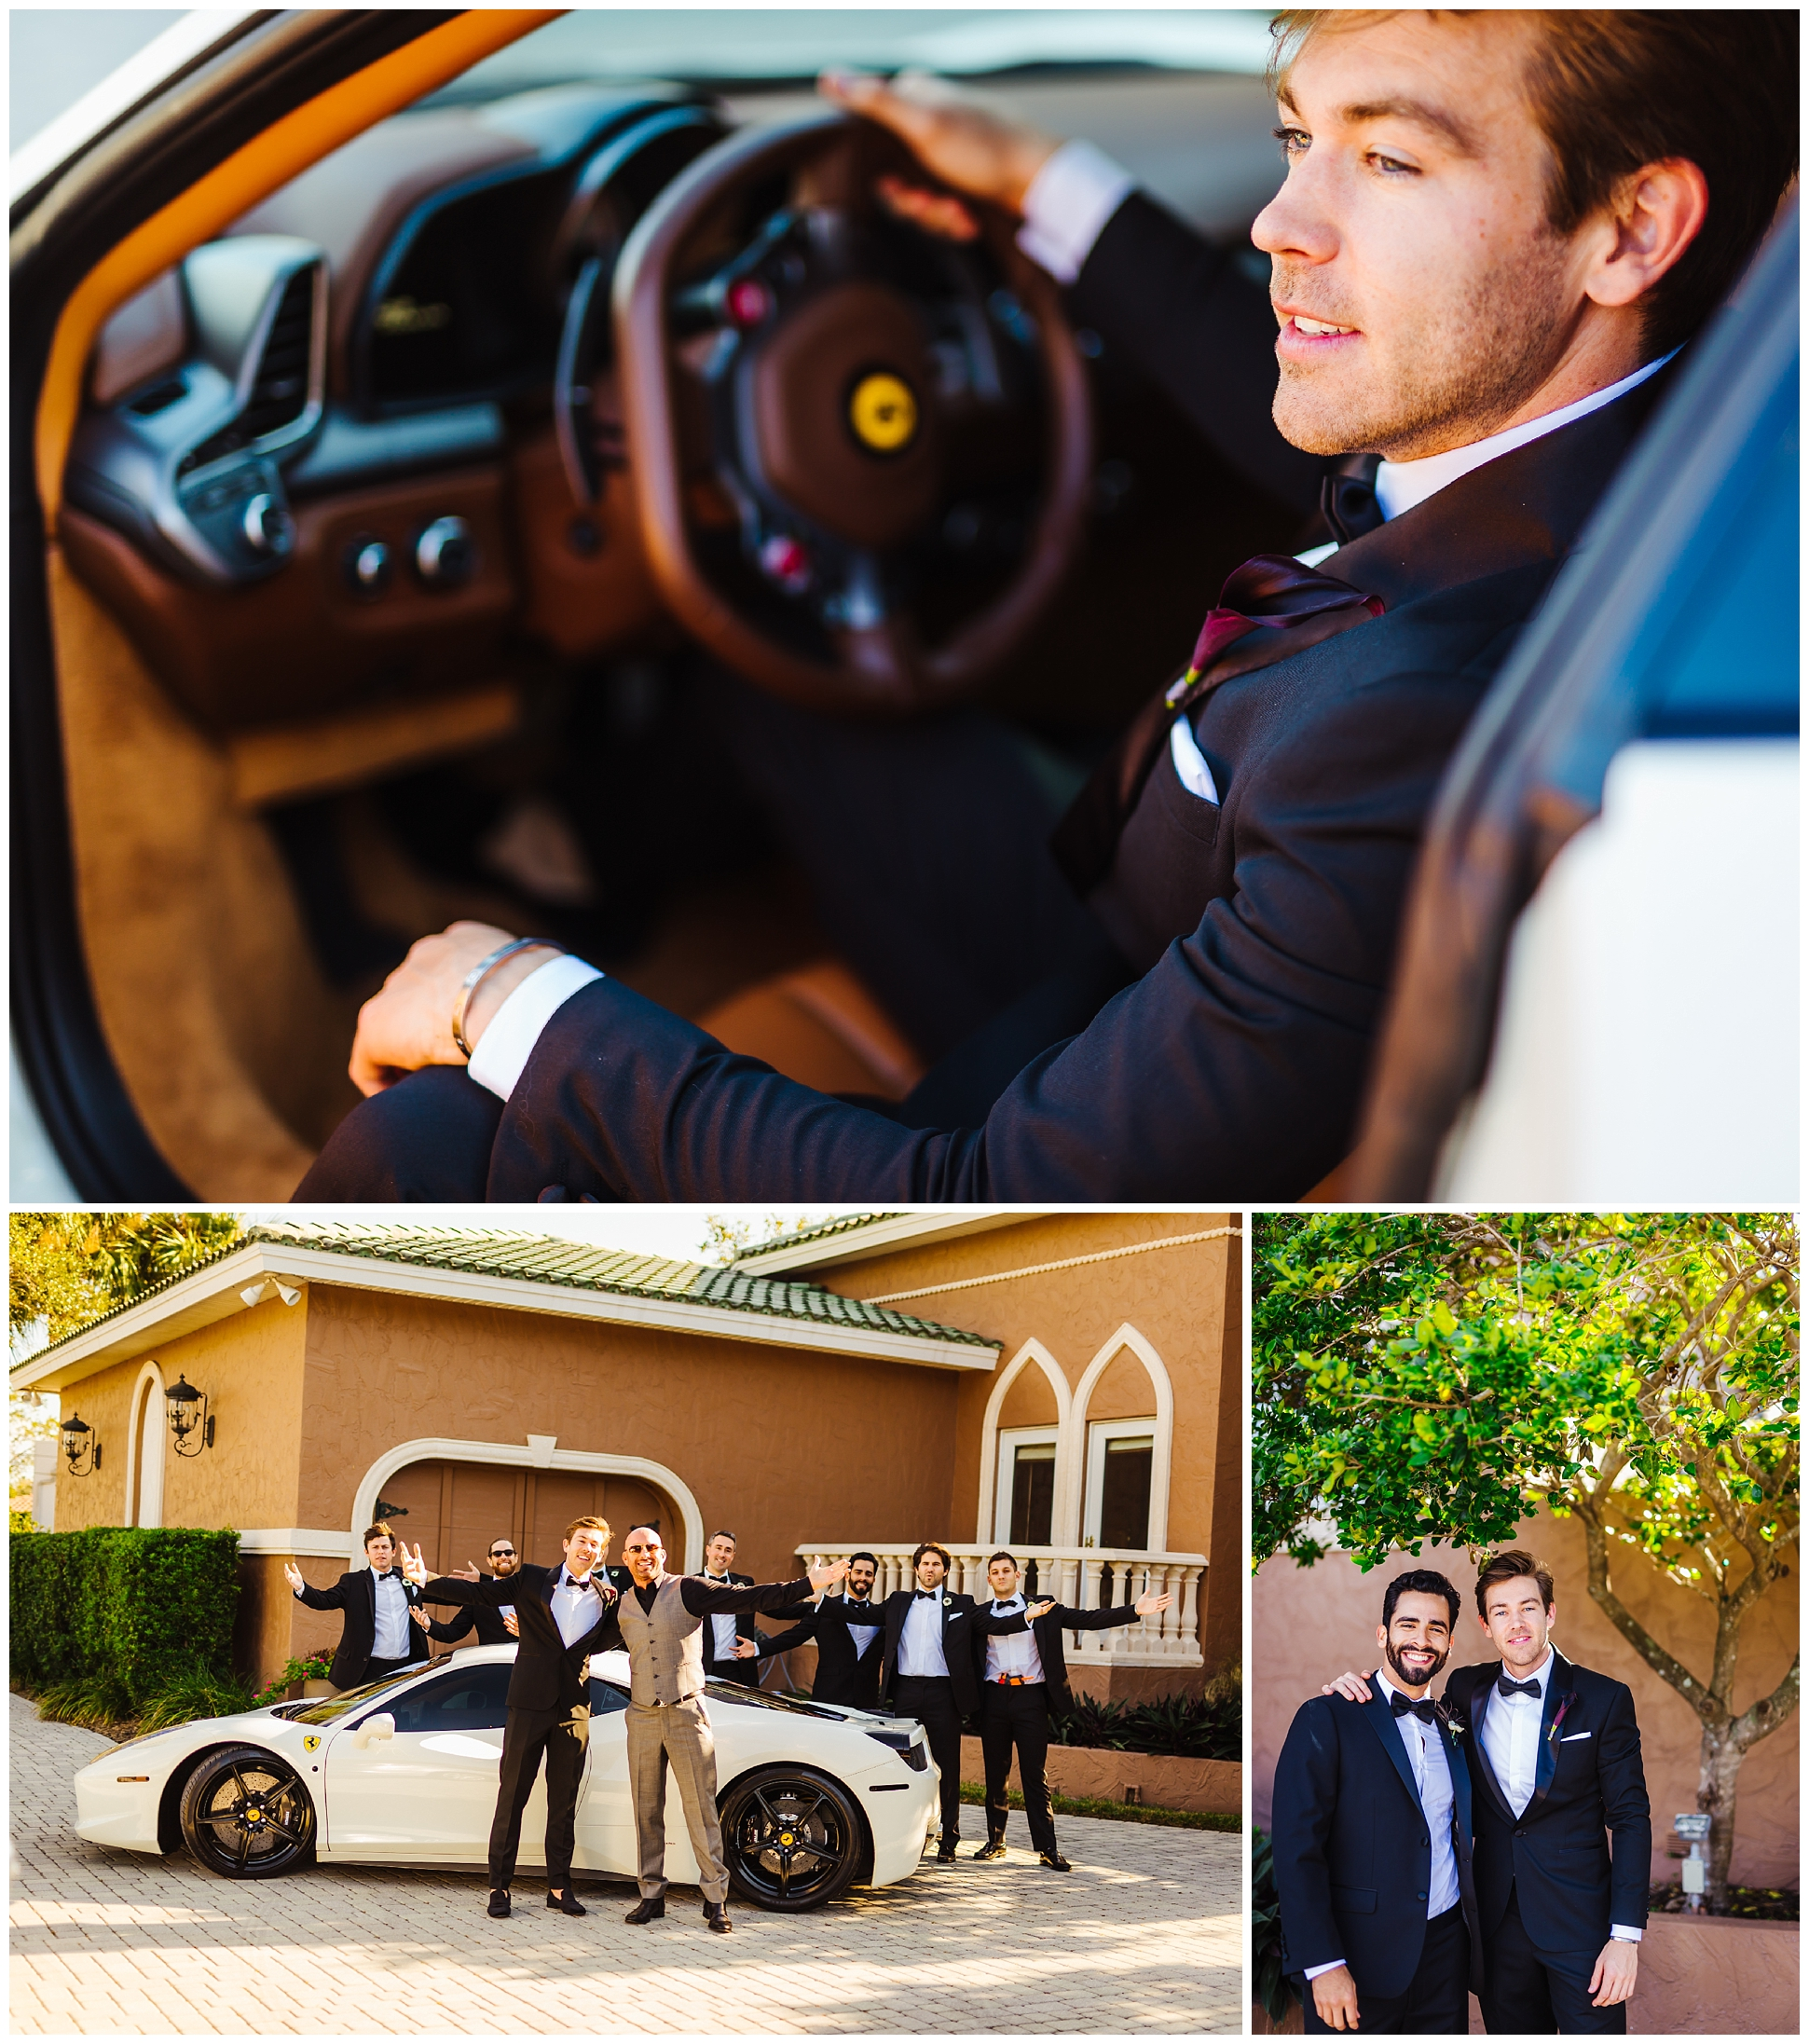 st-pete-wedding-photographer-backyard-luxury-snell-isle-vinoy_0026.jpg